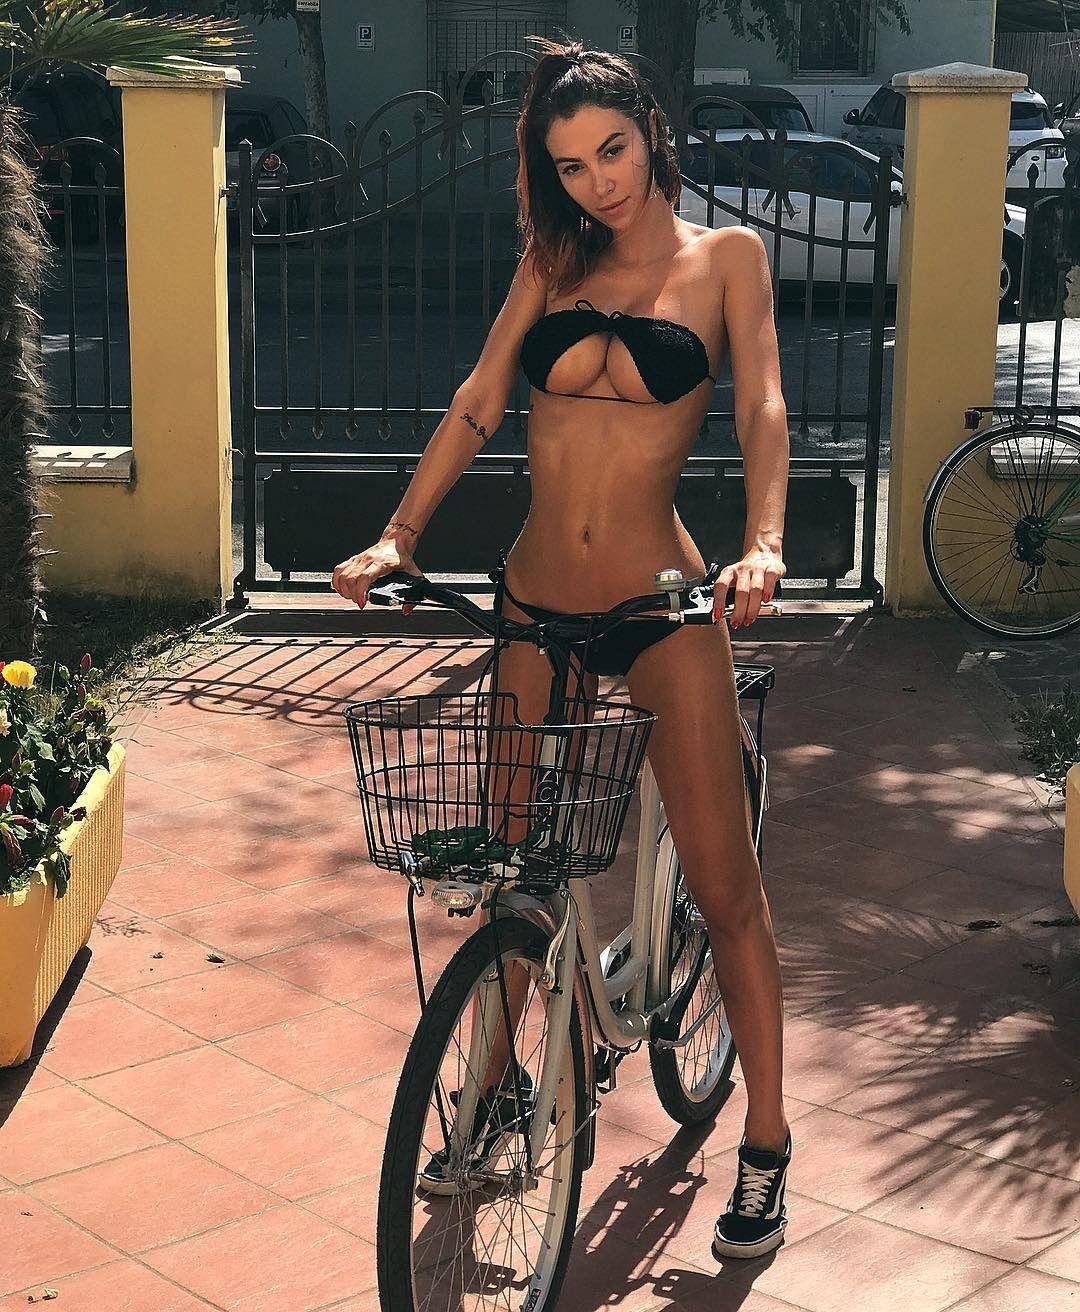 Ass Hargitai Henrietta nude photos 2019